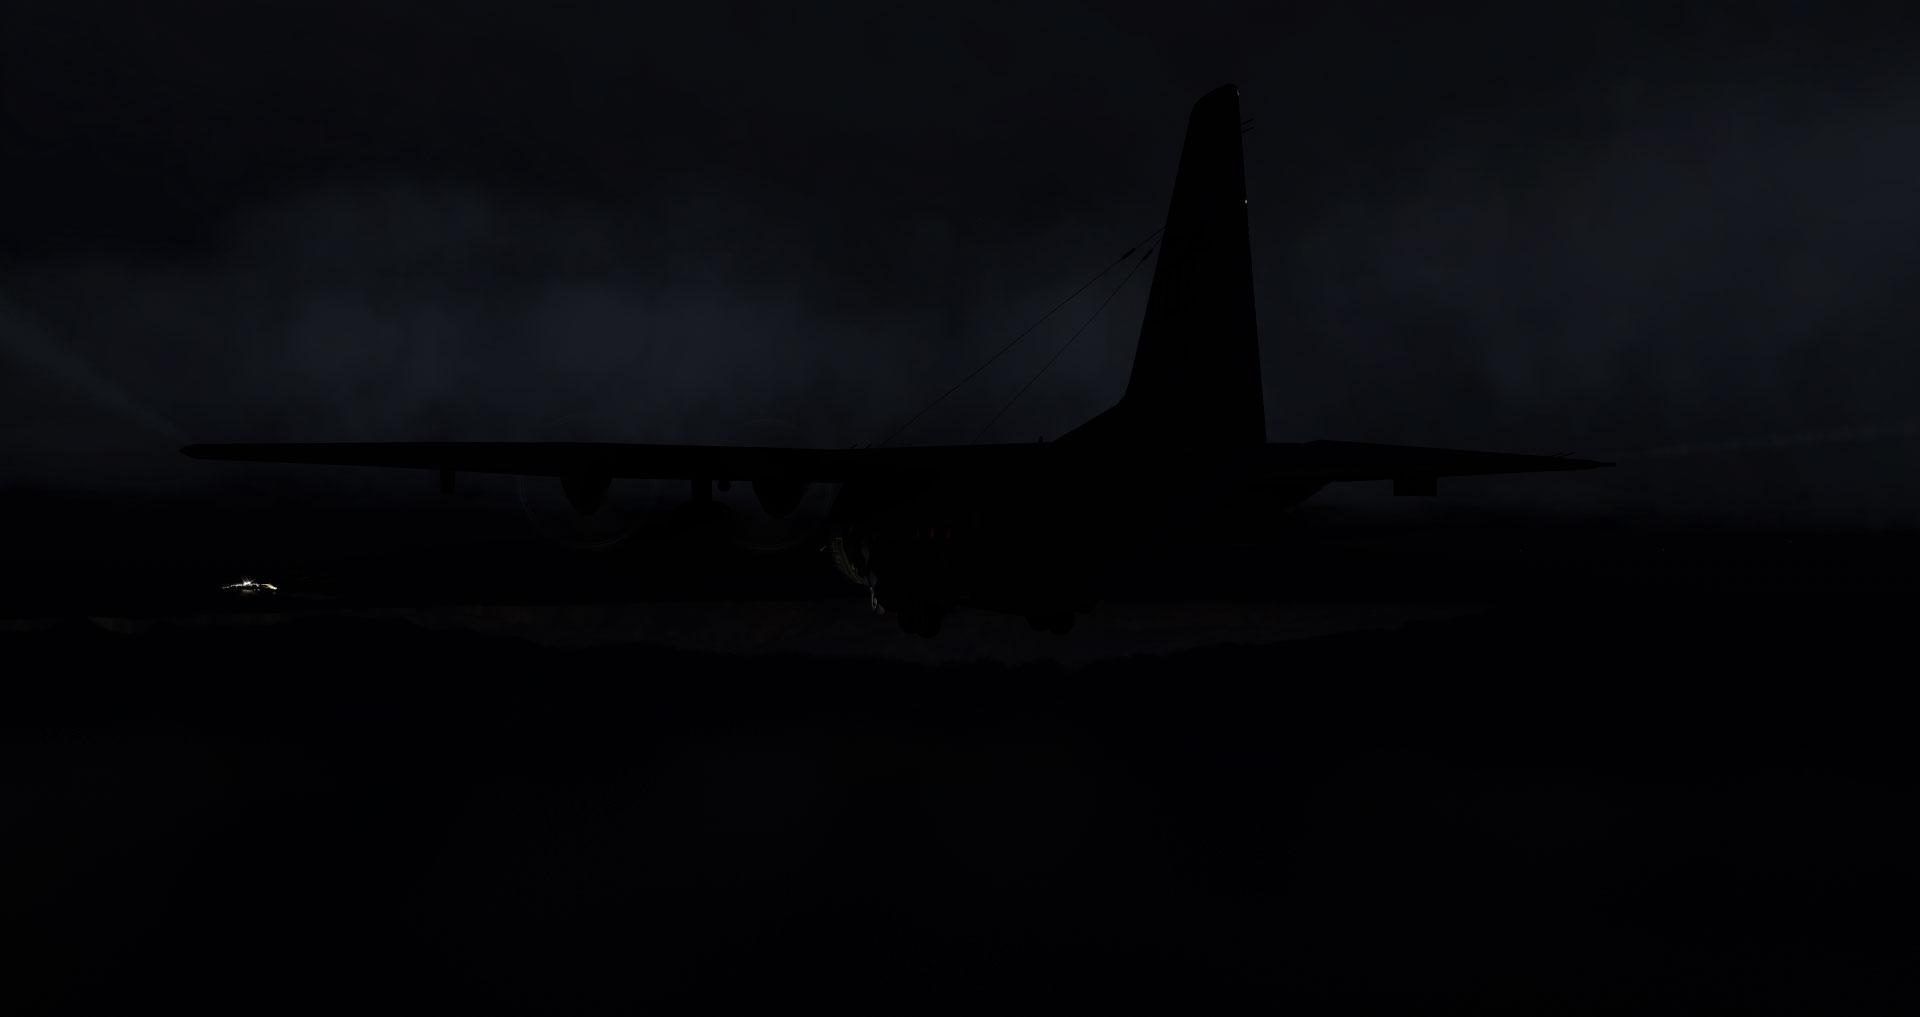 C-130-7